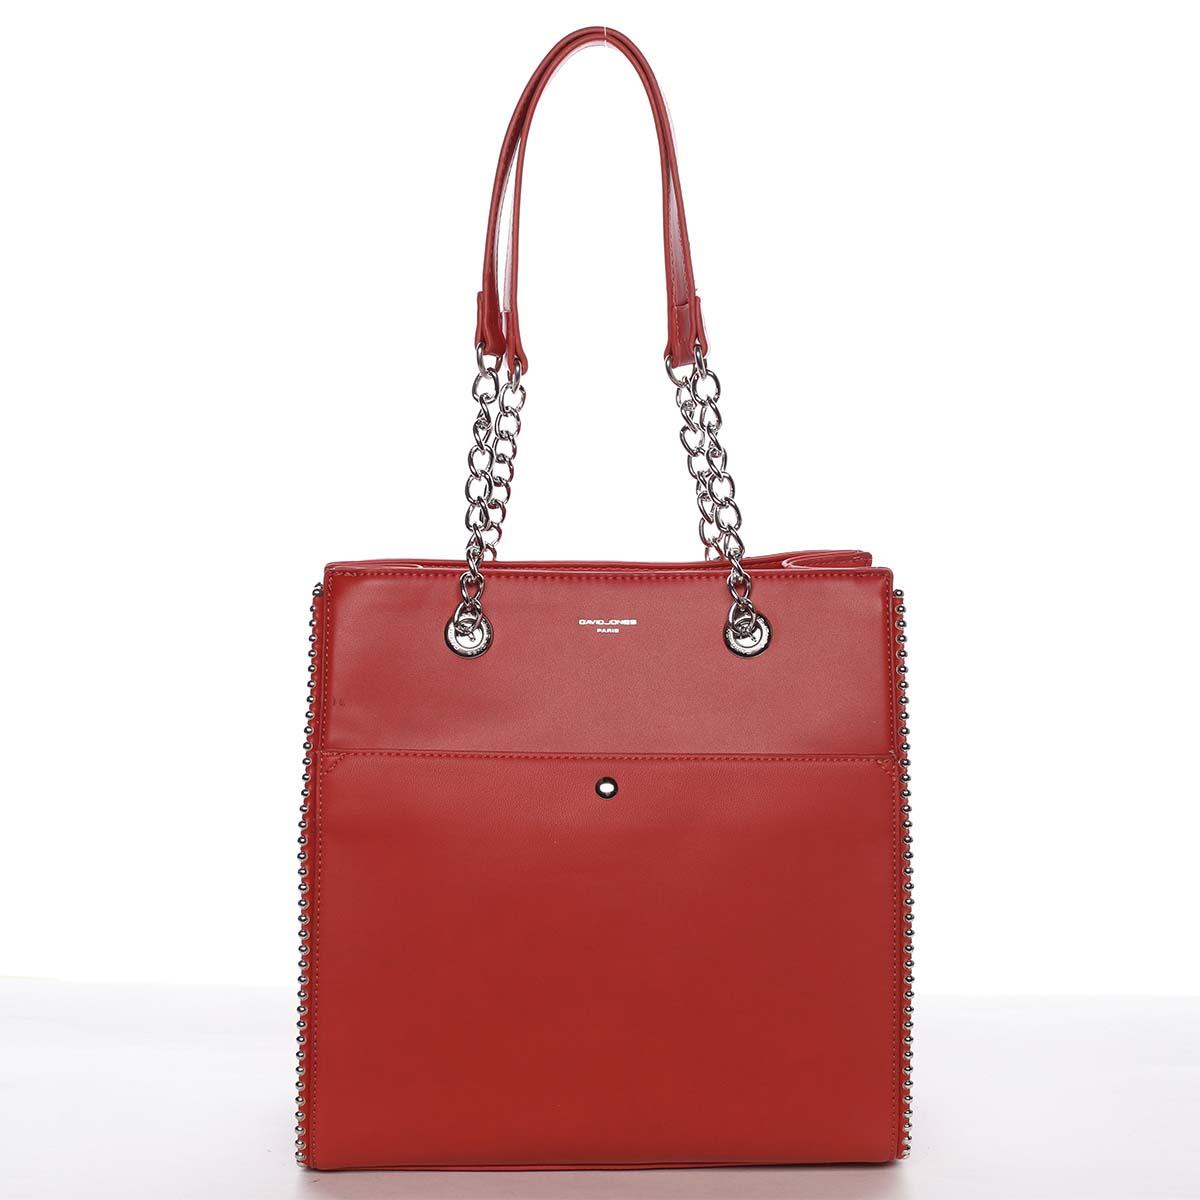 Luxusná a originálna dámska červená kabelka cez plece - David Jones Mishel